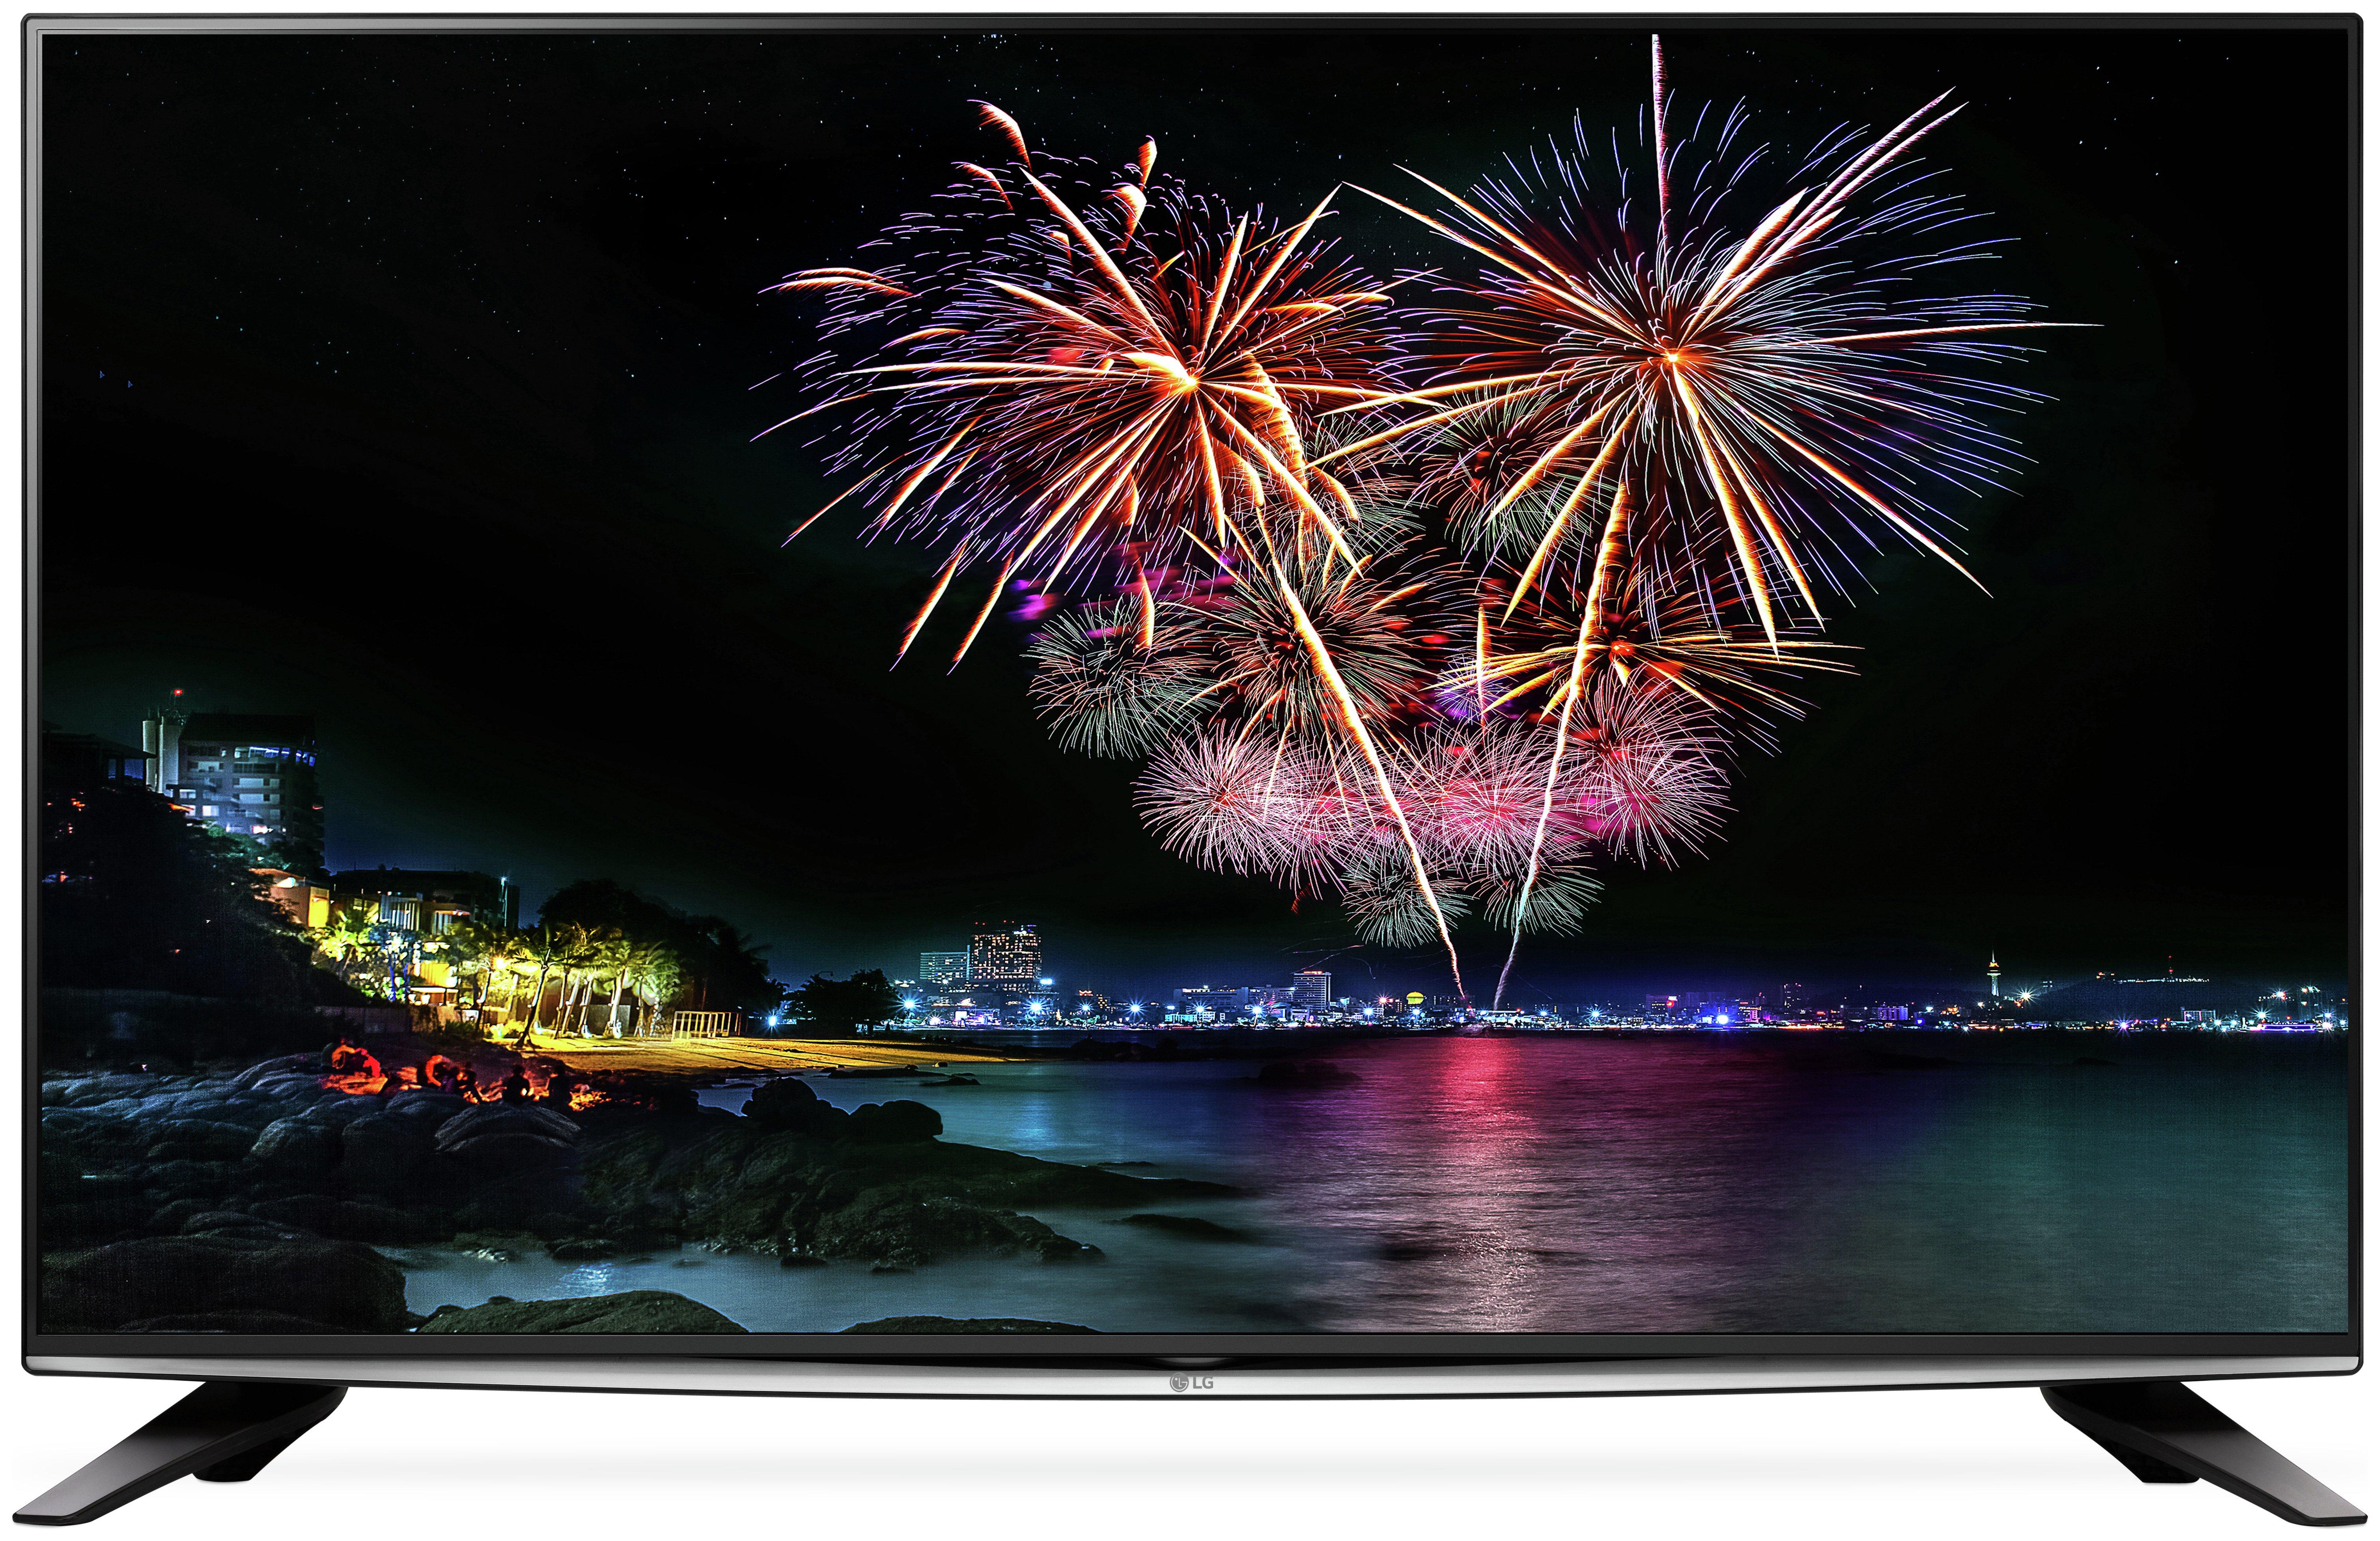 LG - 50 Inch - 50UH635V - Ultra HD 4K Web OS - Smart LED TV. - Black